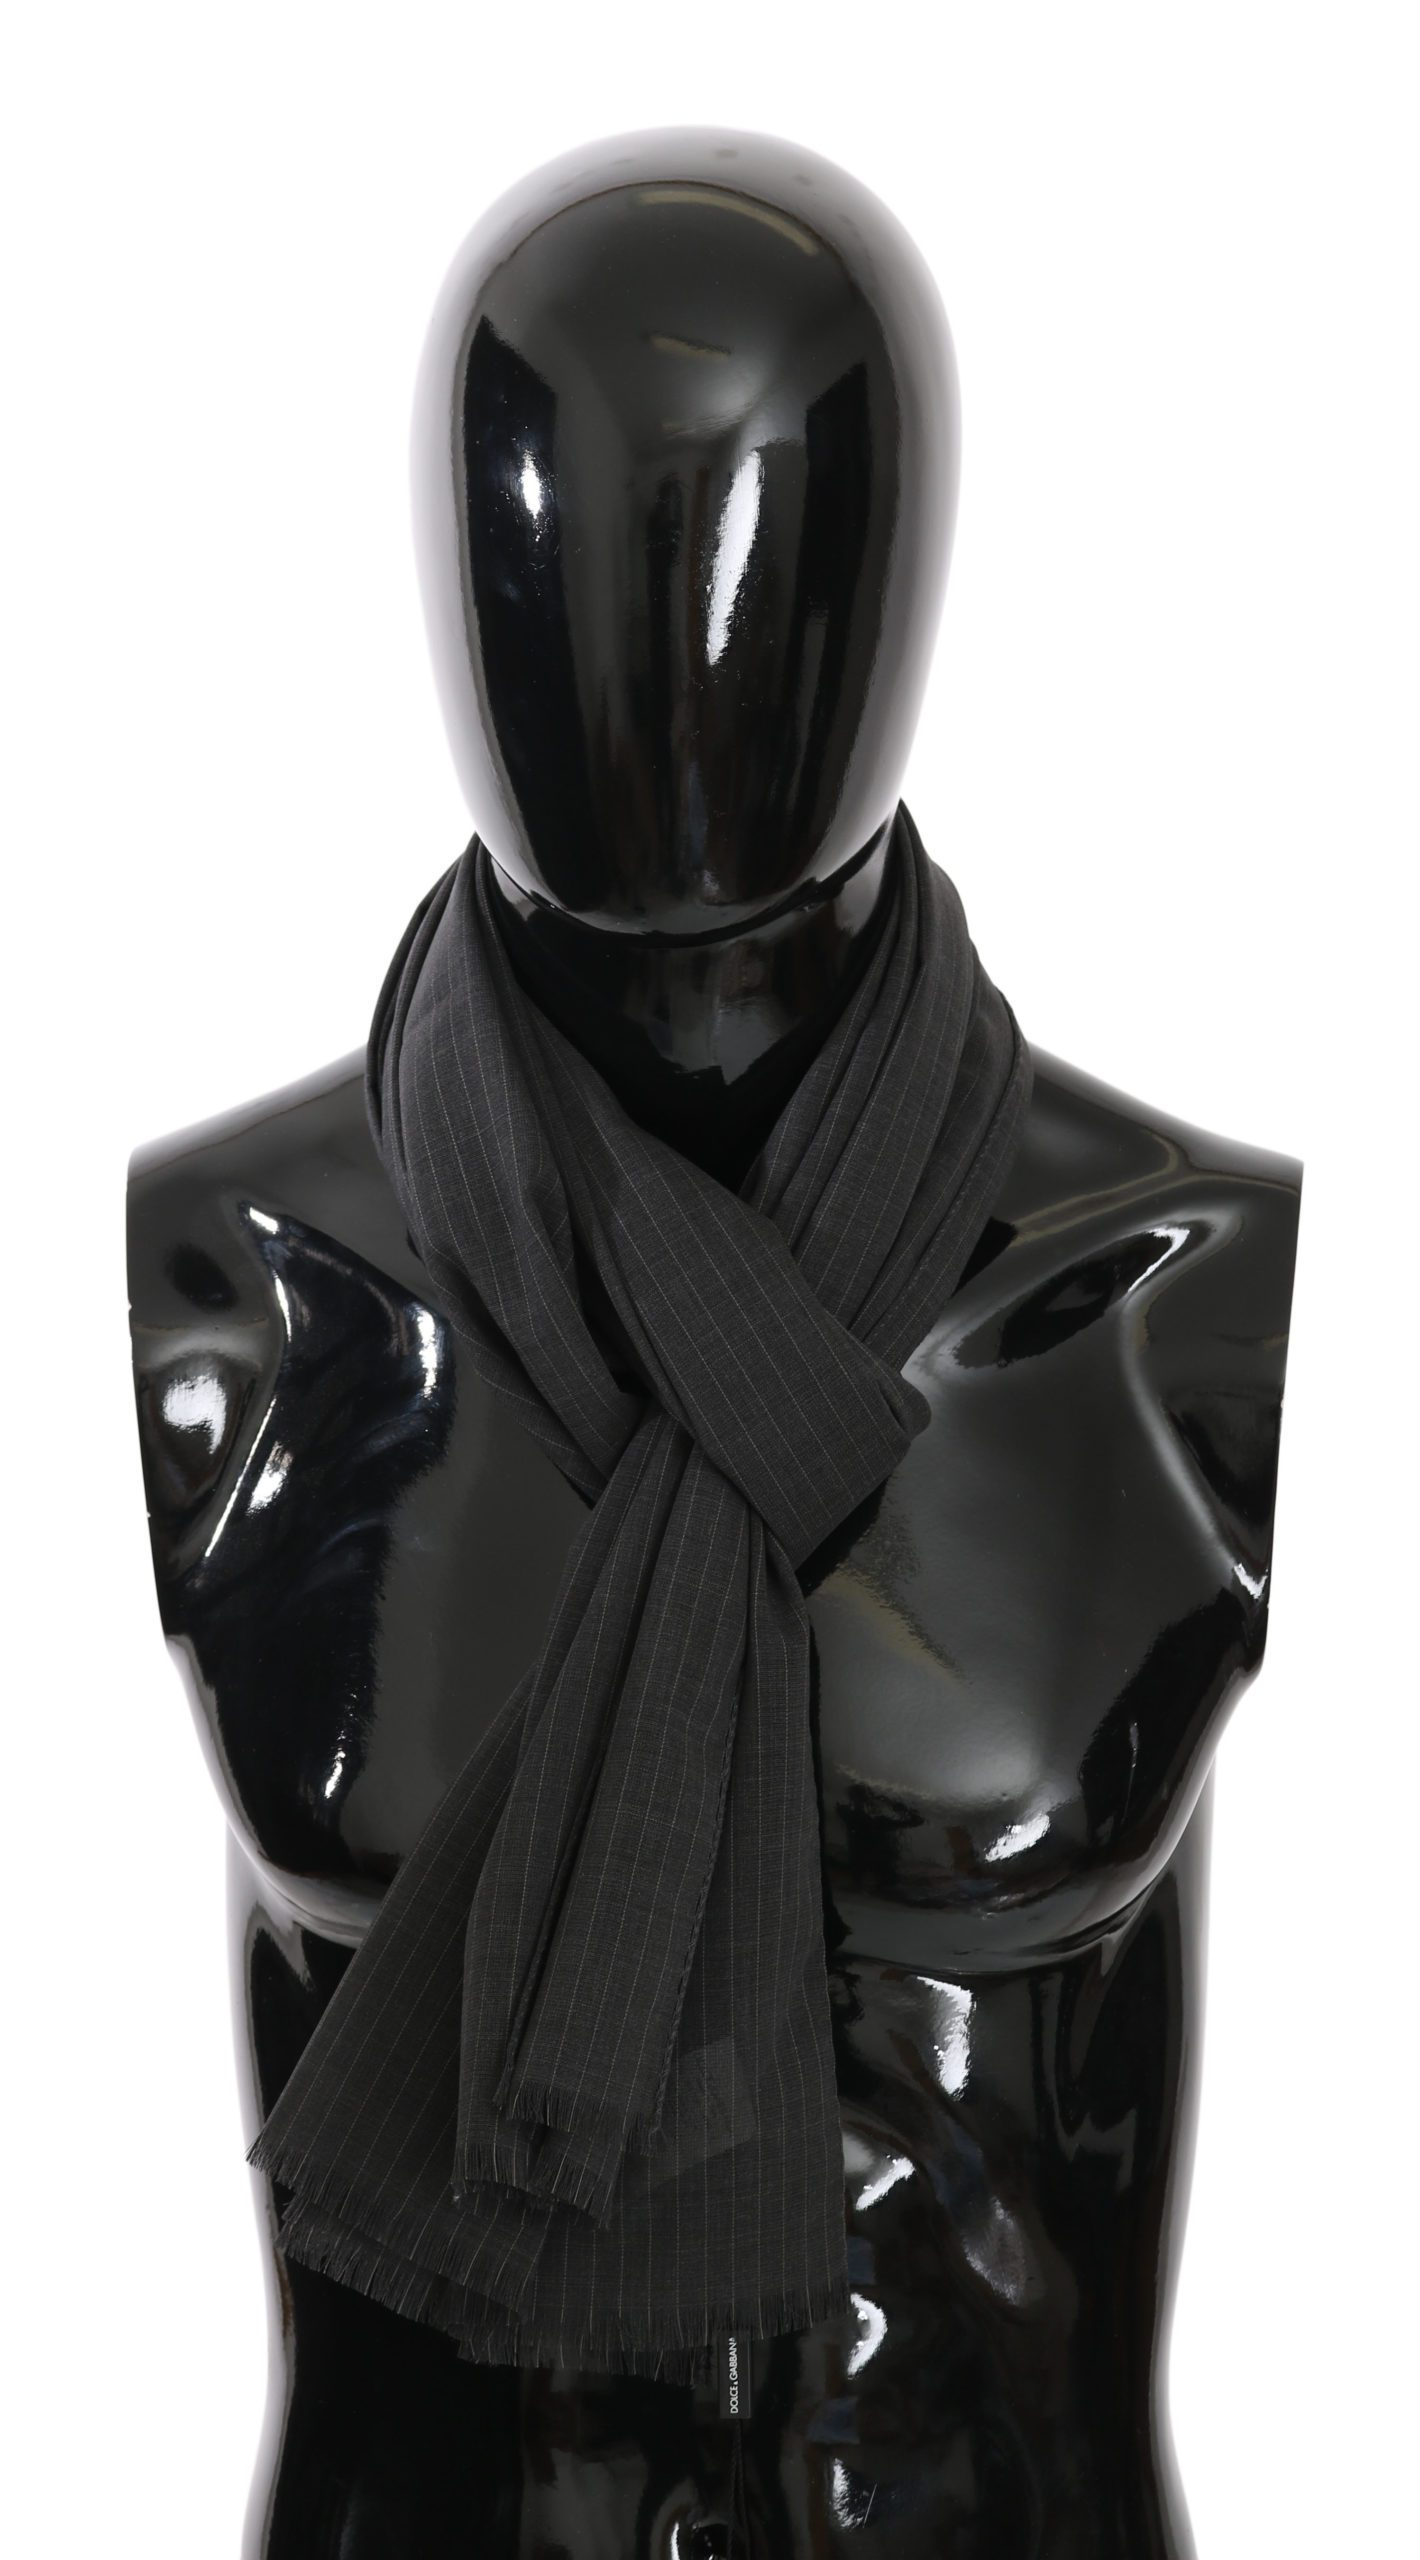 Dolce & Gabbana Men's Striped Silk Scarf Black MS5014BG